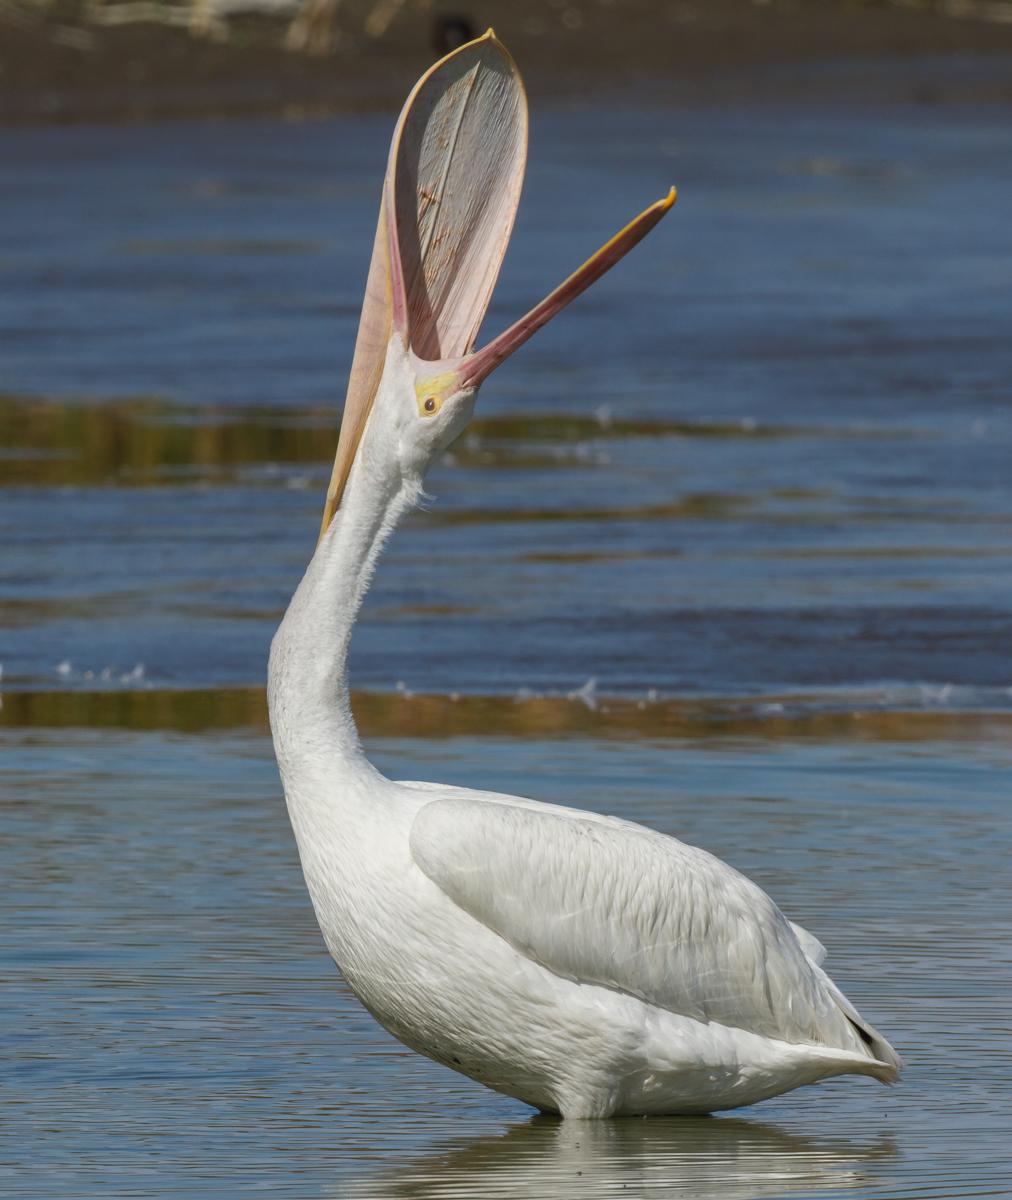 white-pelican-pouch-stretch-vertical.jpg